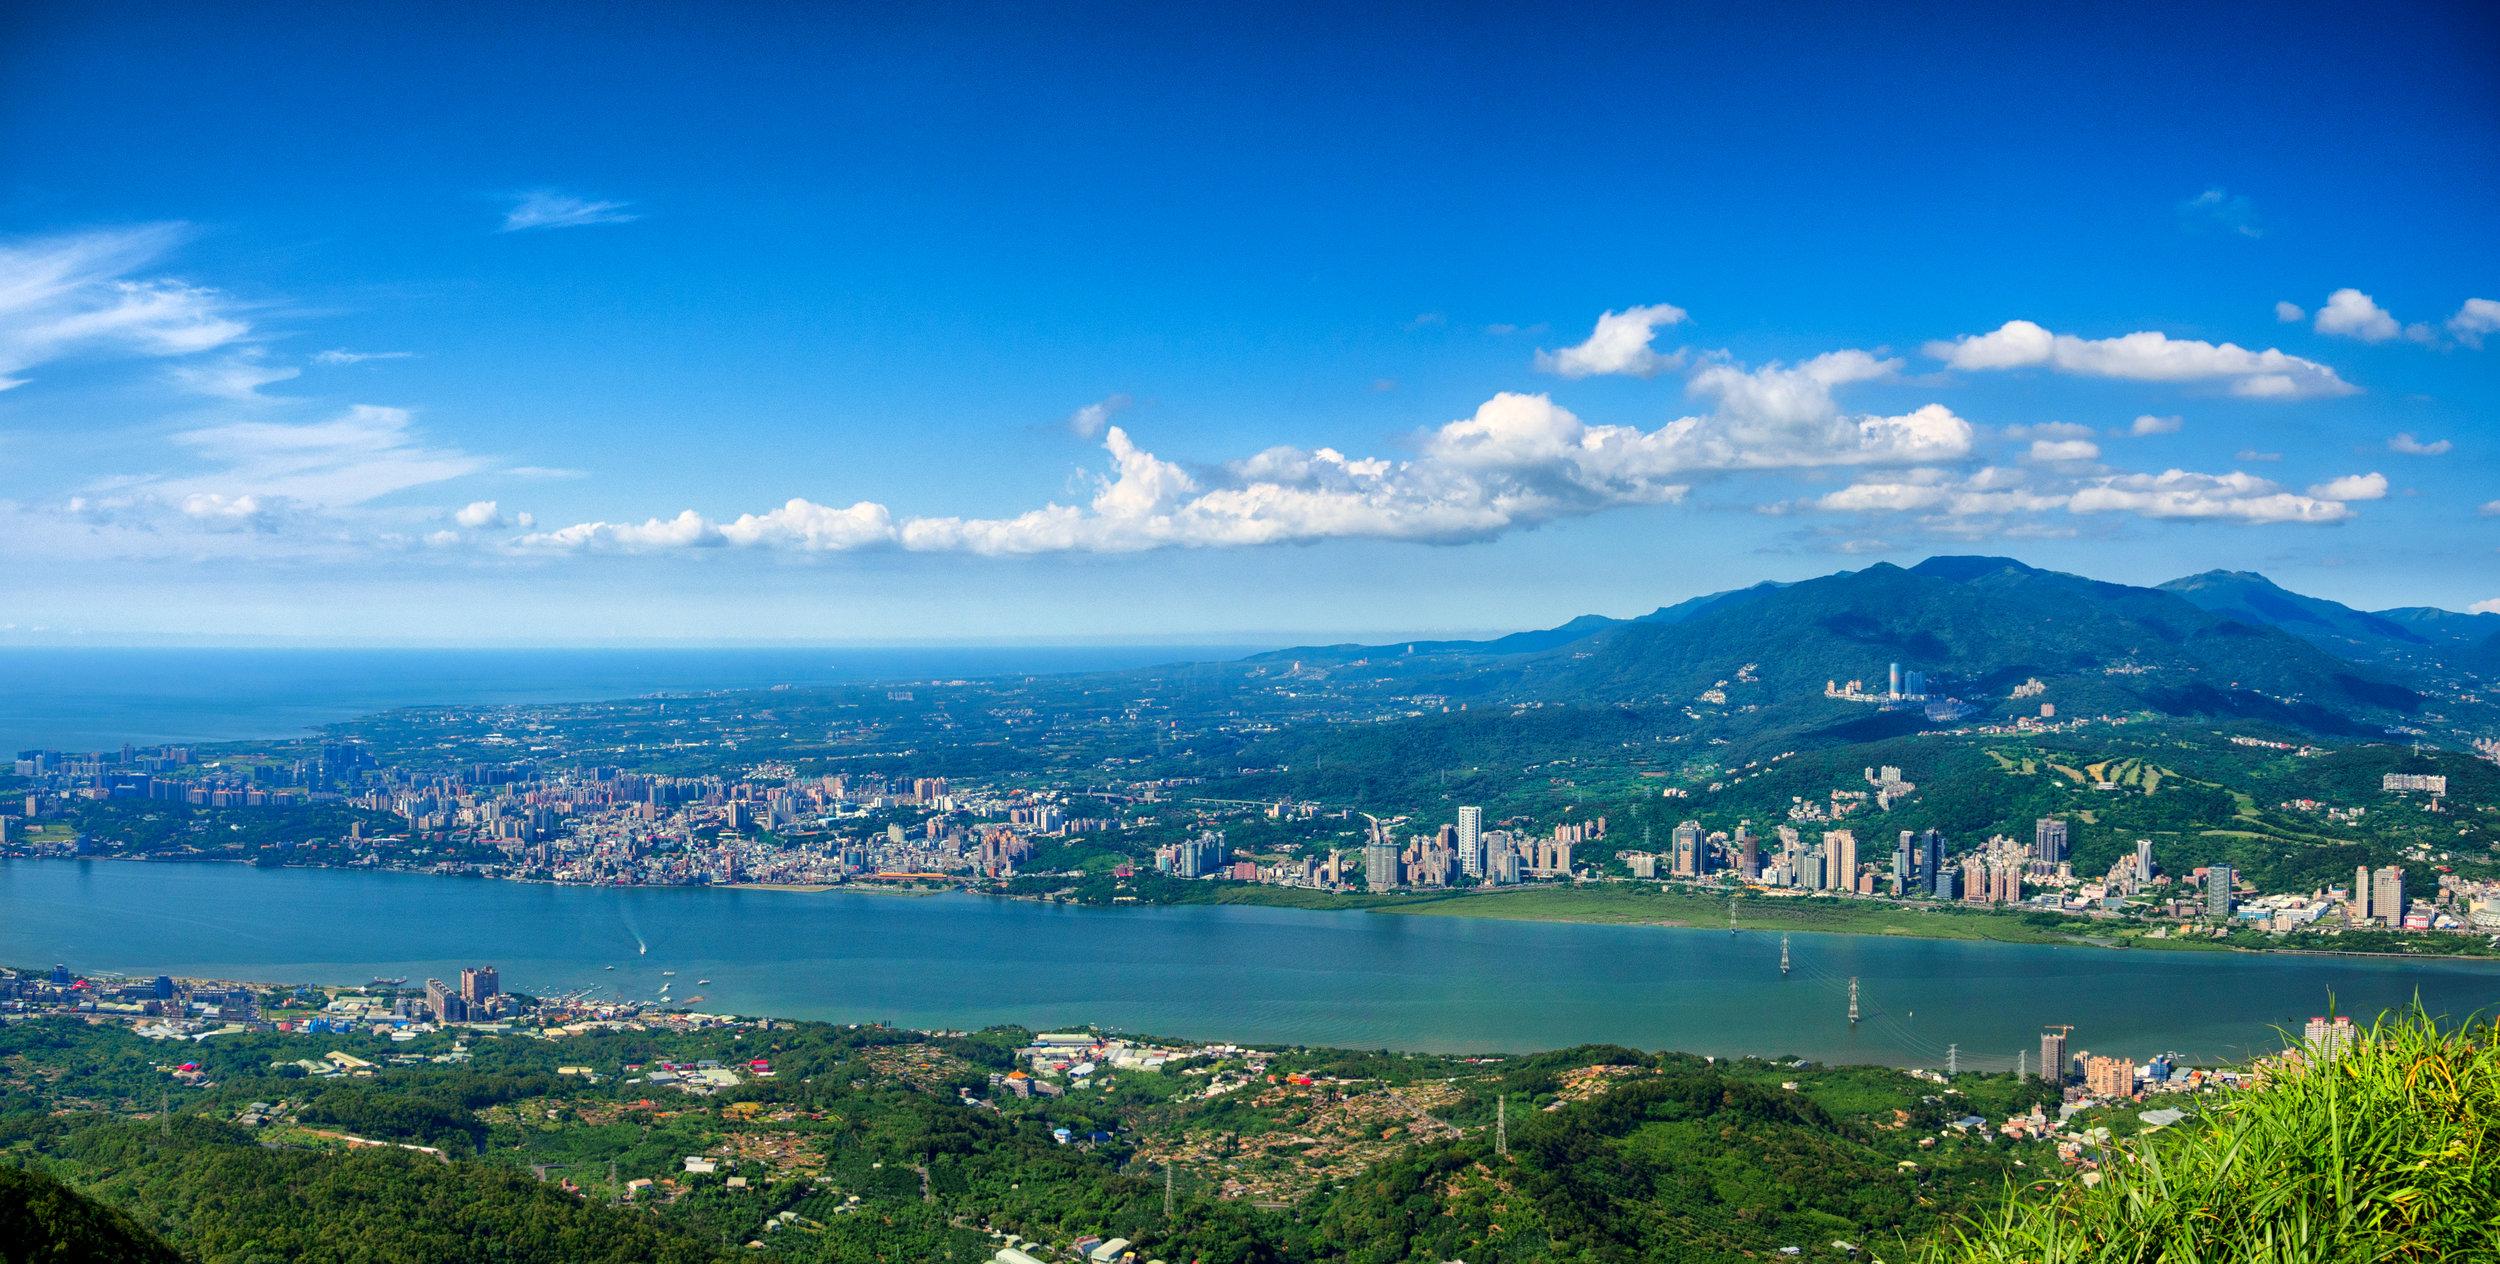 Mt. Yinghan - Hiking Guide